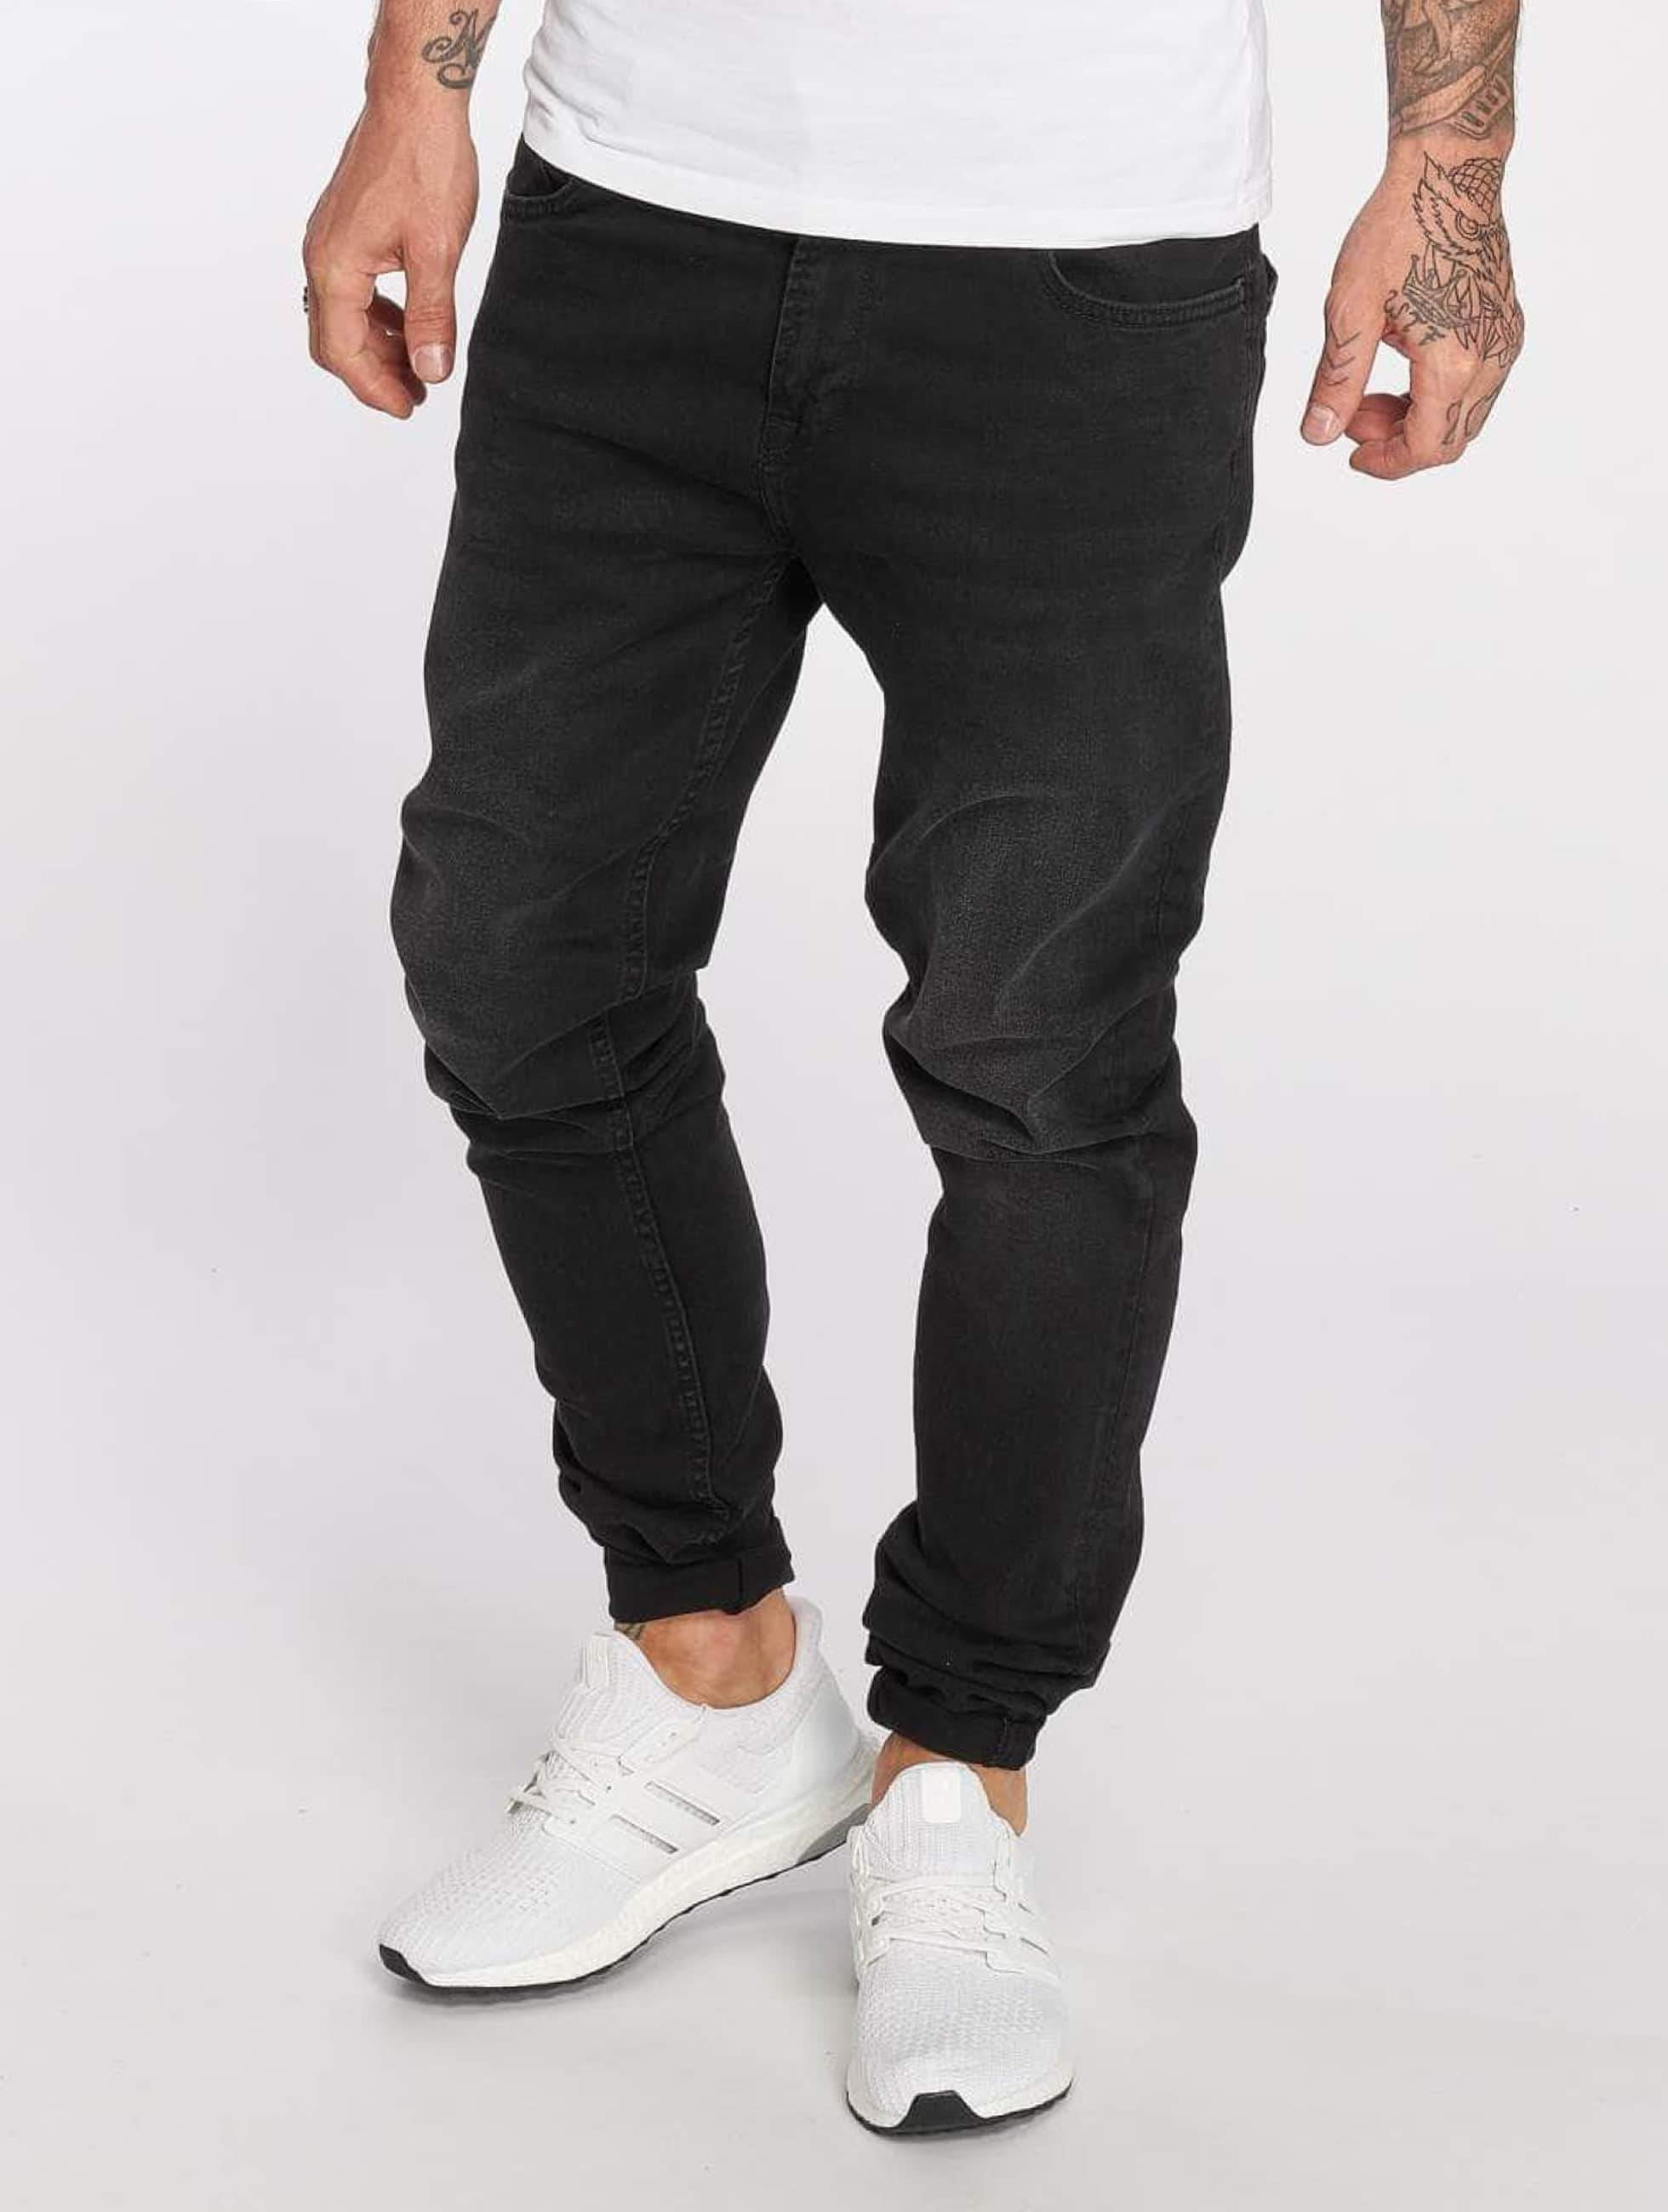 DEF / Slim Fit Jeans Holger in black W 36 L 34